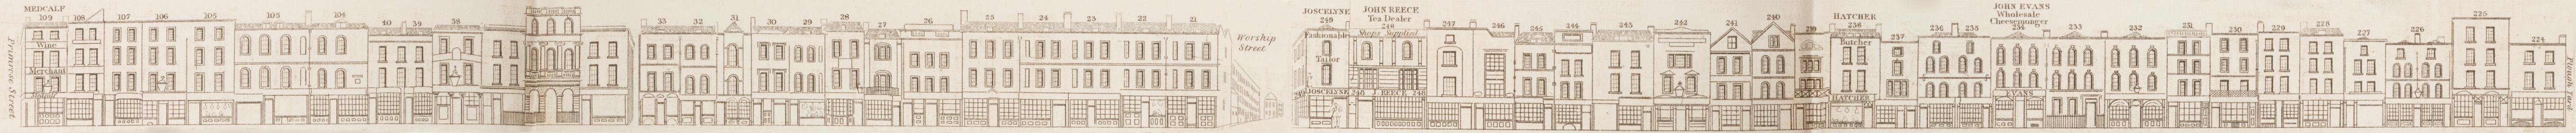 map - Tallis's London street views : No. 60. Norton Folgate and Shoreditch, division 1 (west)